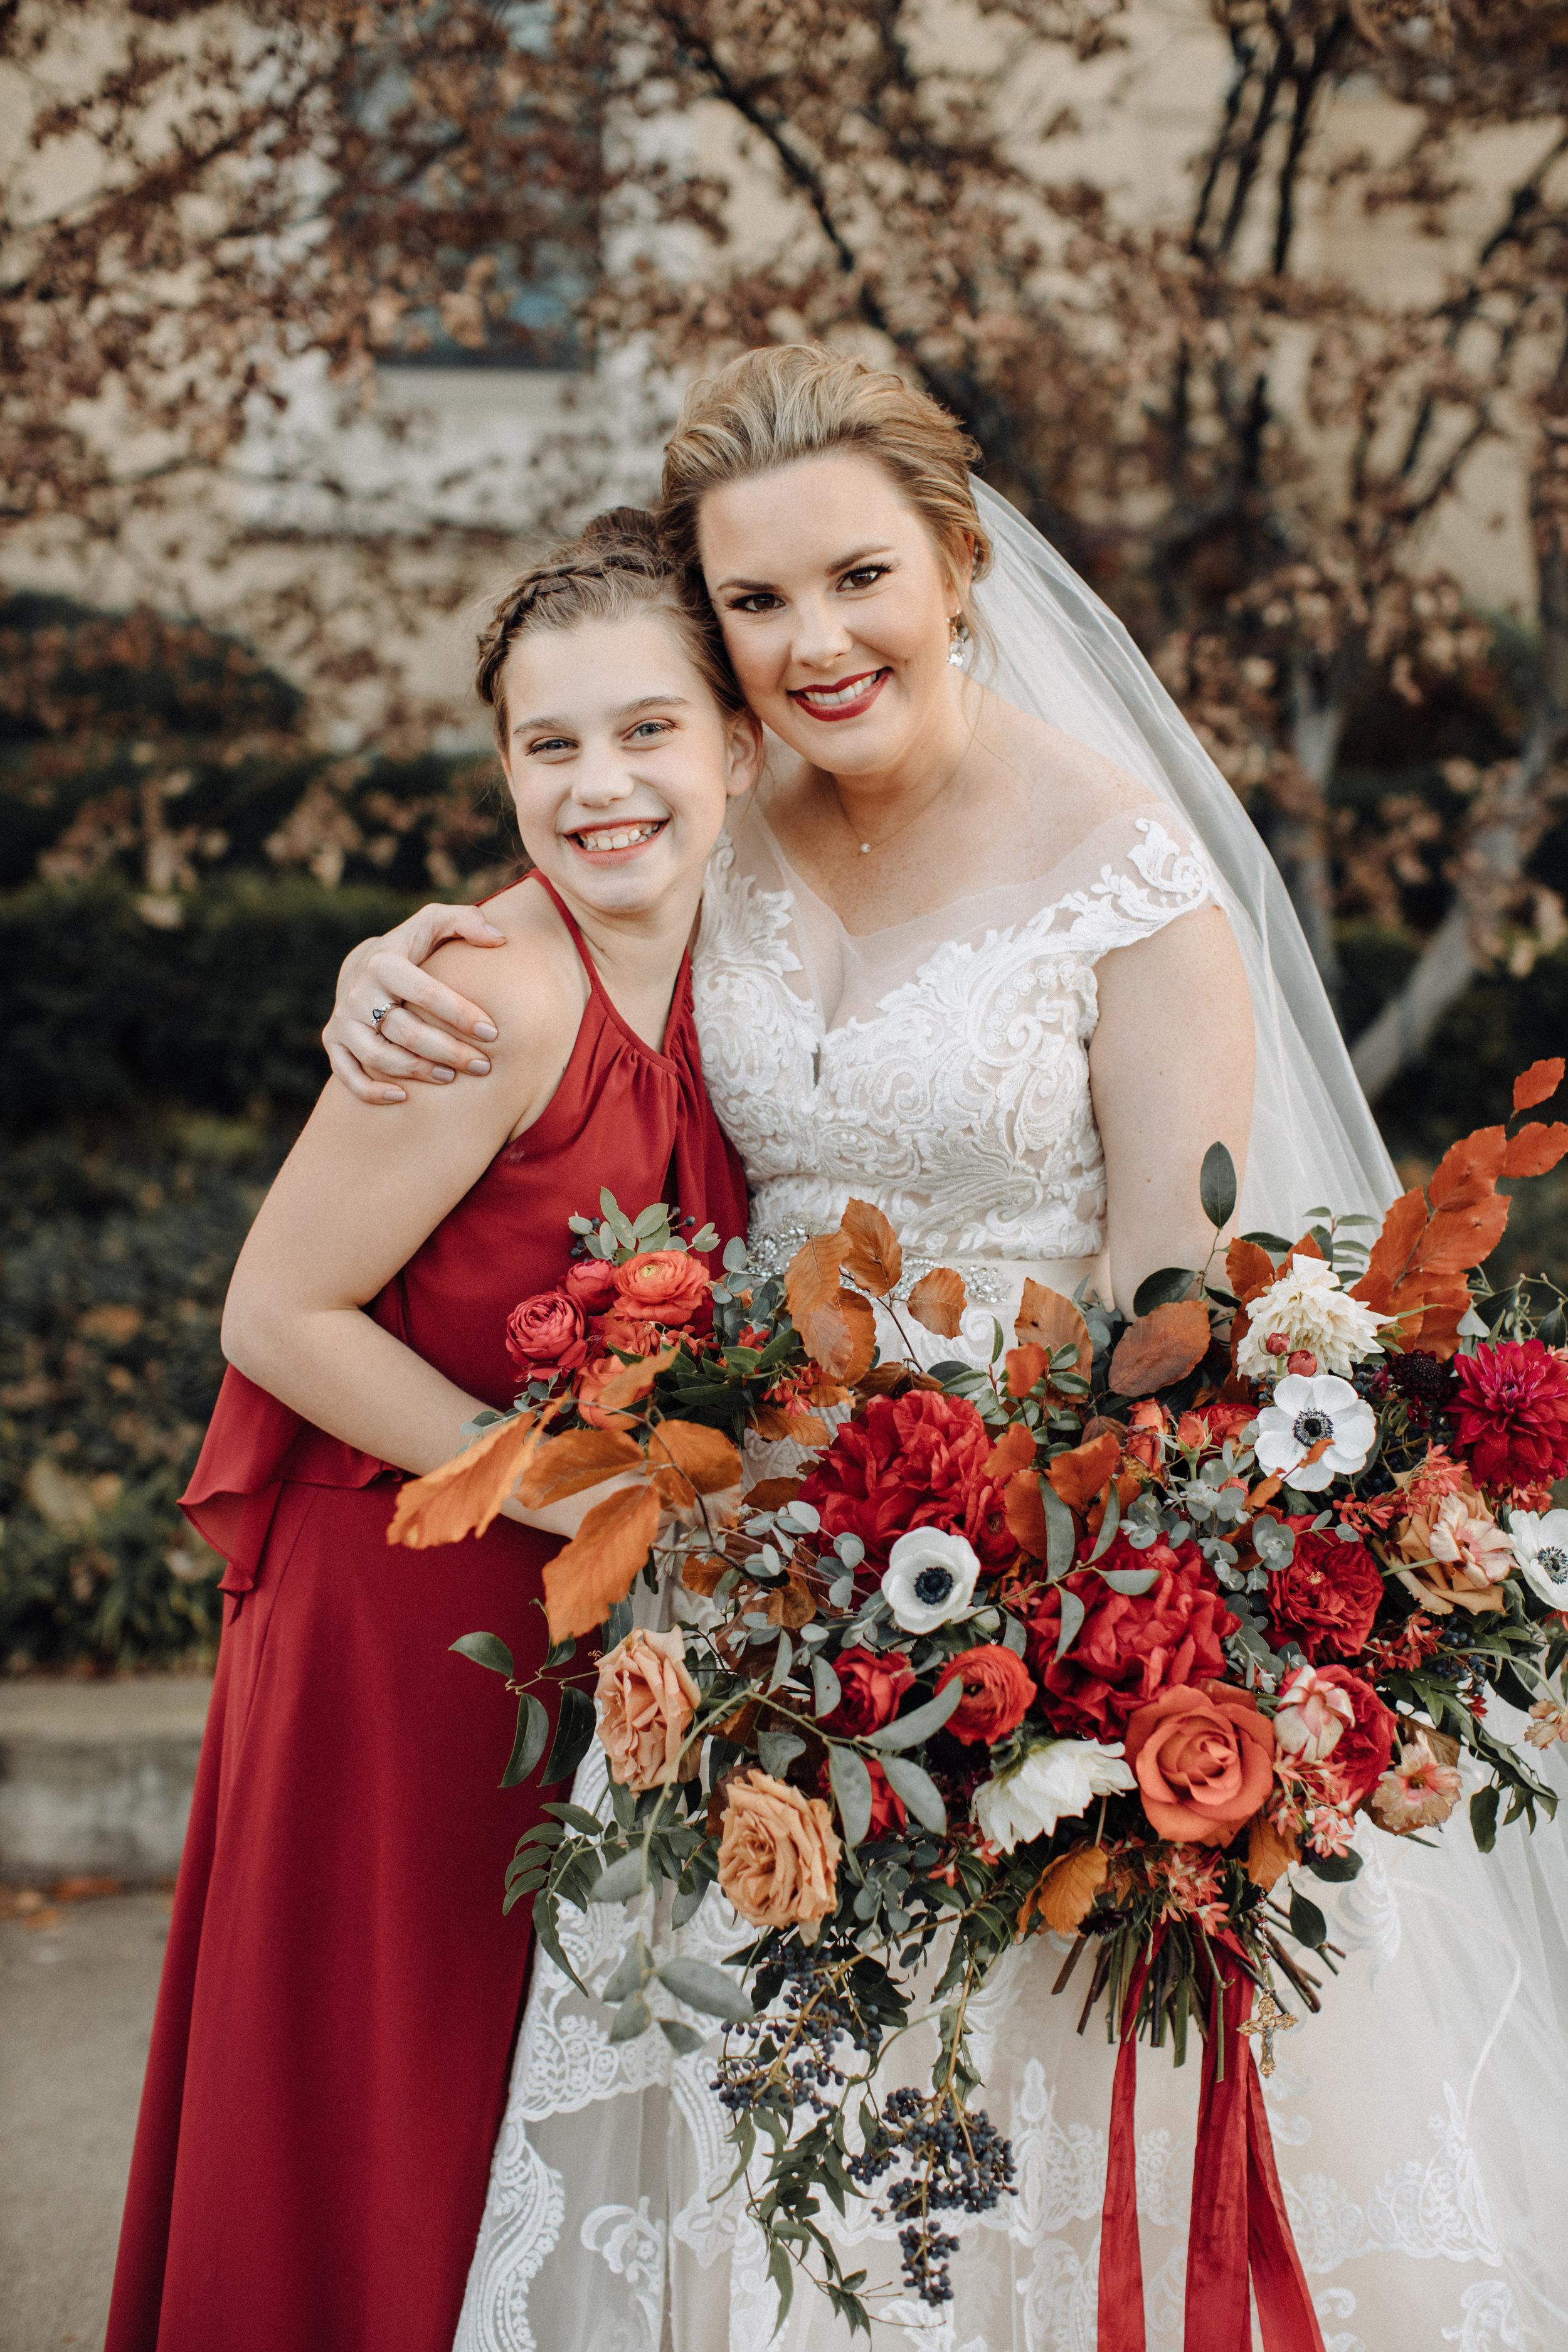 Burgundy velvet bridesmaid dresses with lush, asymmetrical bouquets using garden roses, ranunculus, and anemones